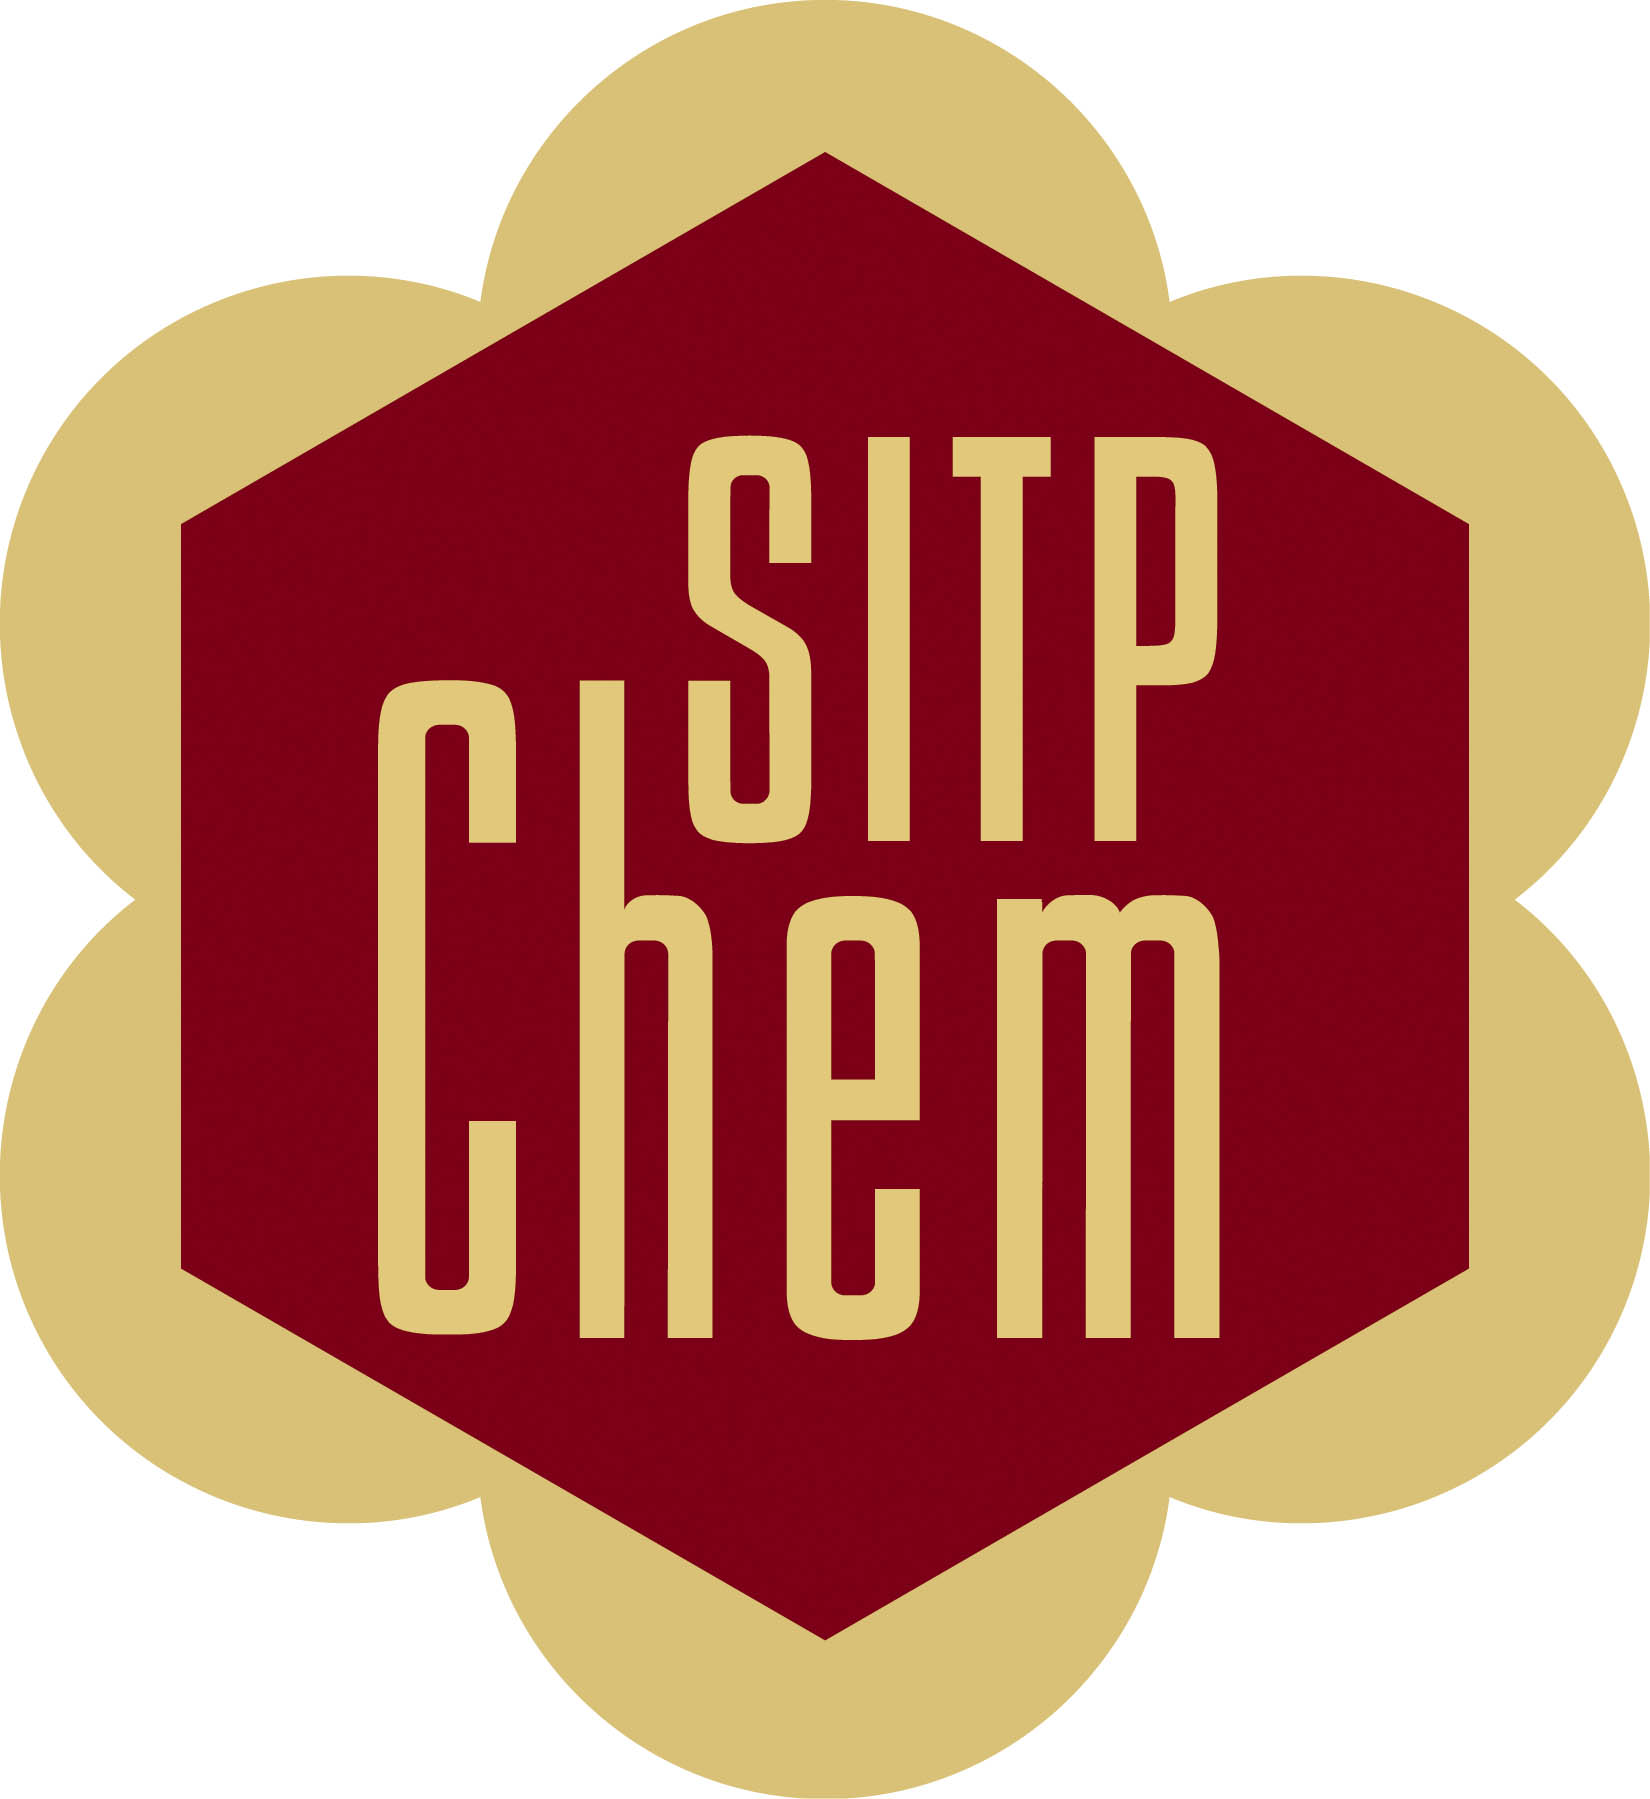 logo-sitpechem NOWE OK kolor (2)